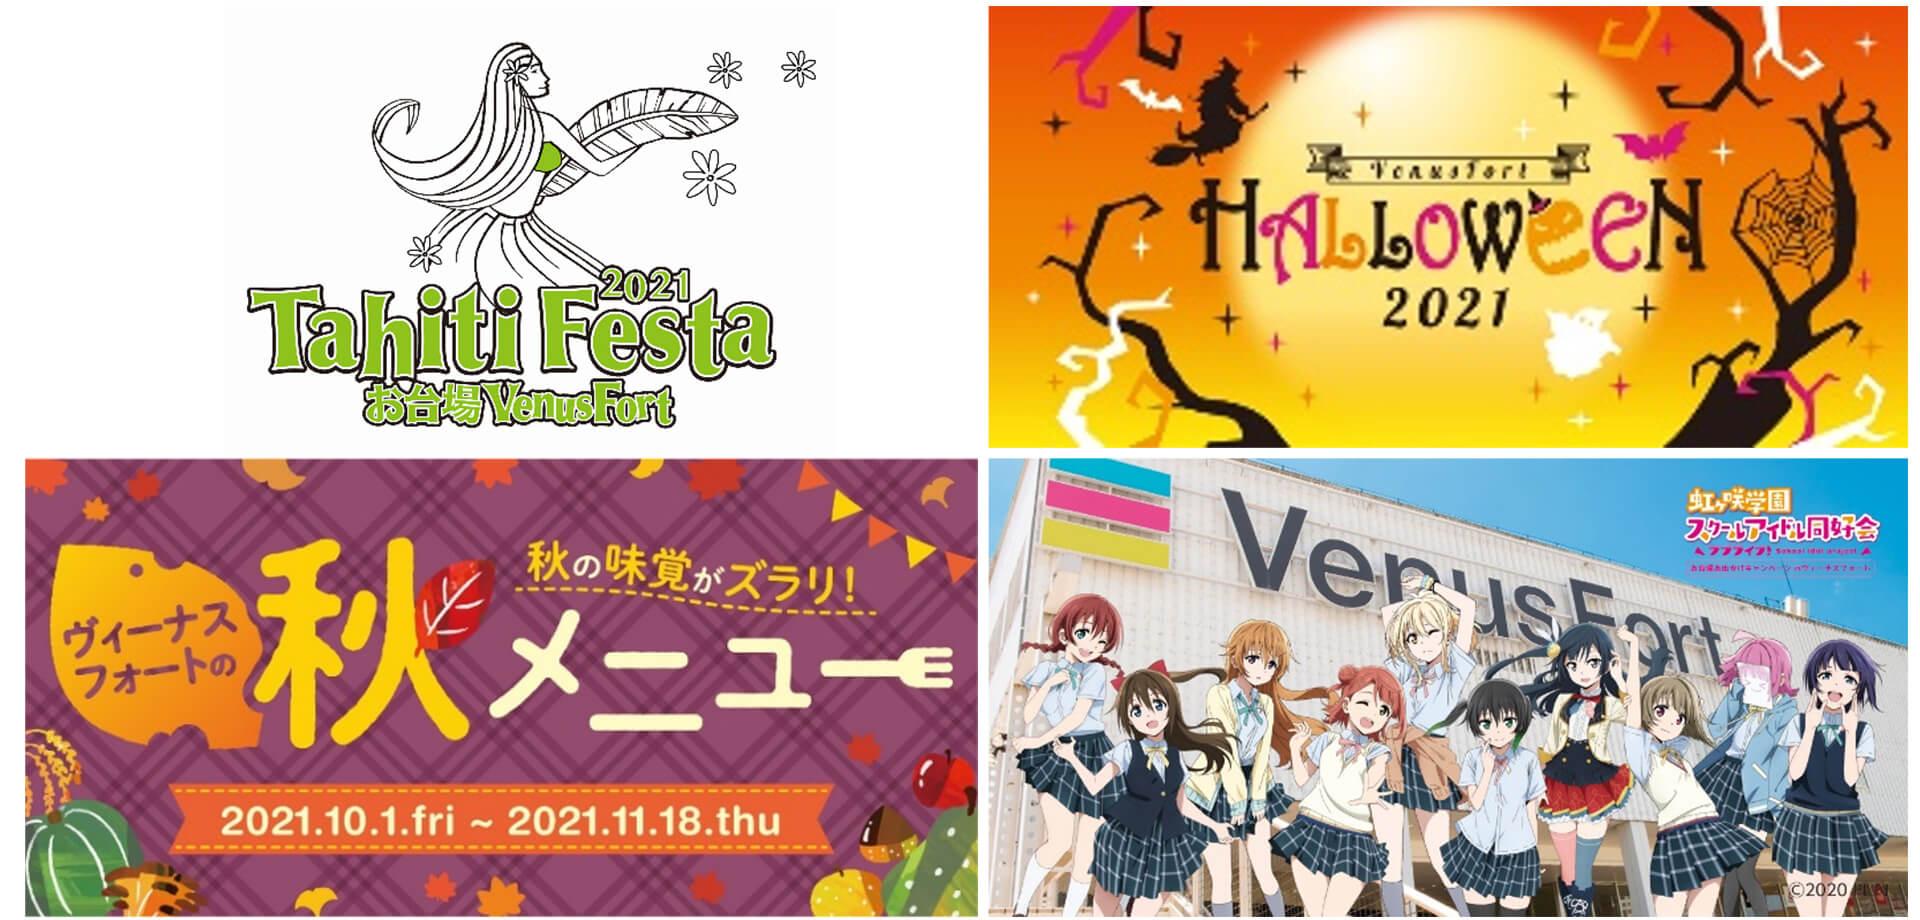 VenusFort 秋イベント